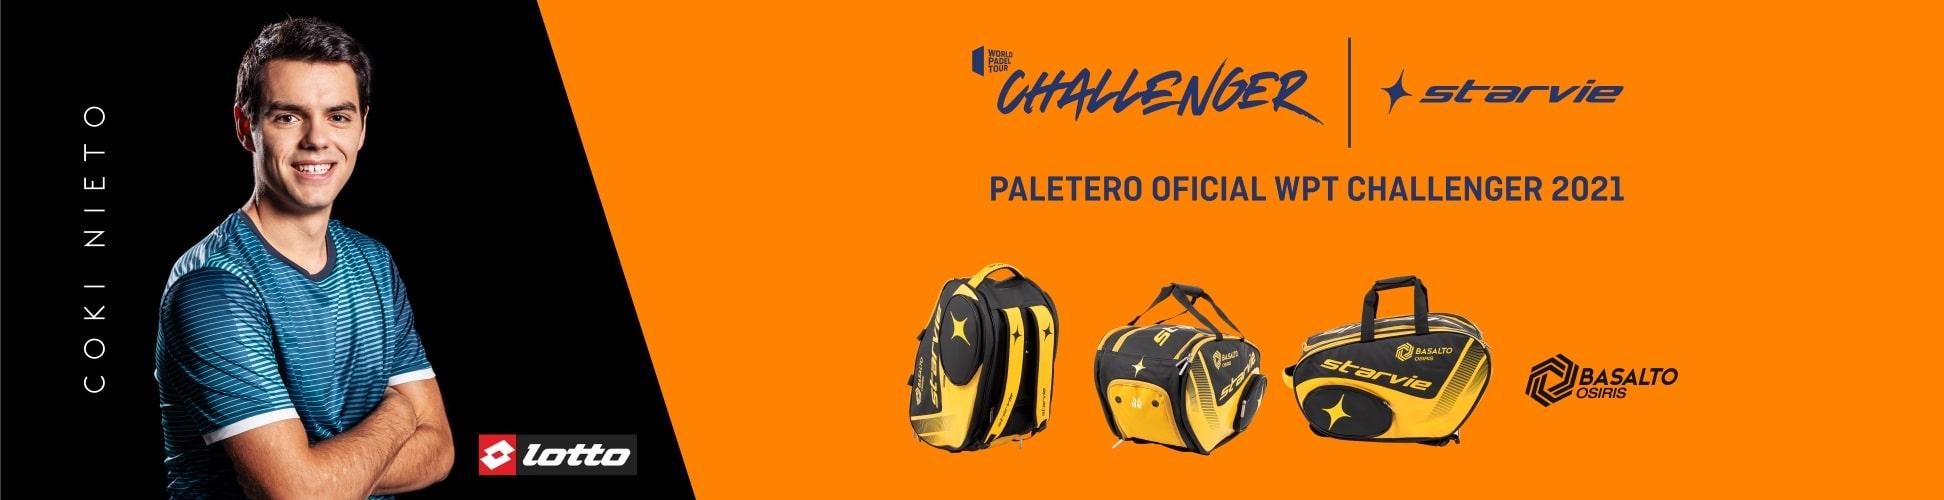 StarVie paletero oficial WPT Challenger 2021